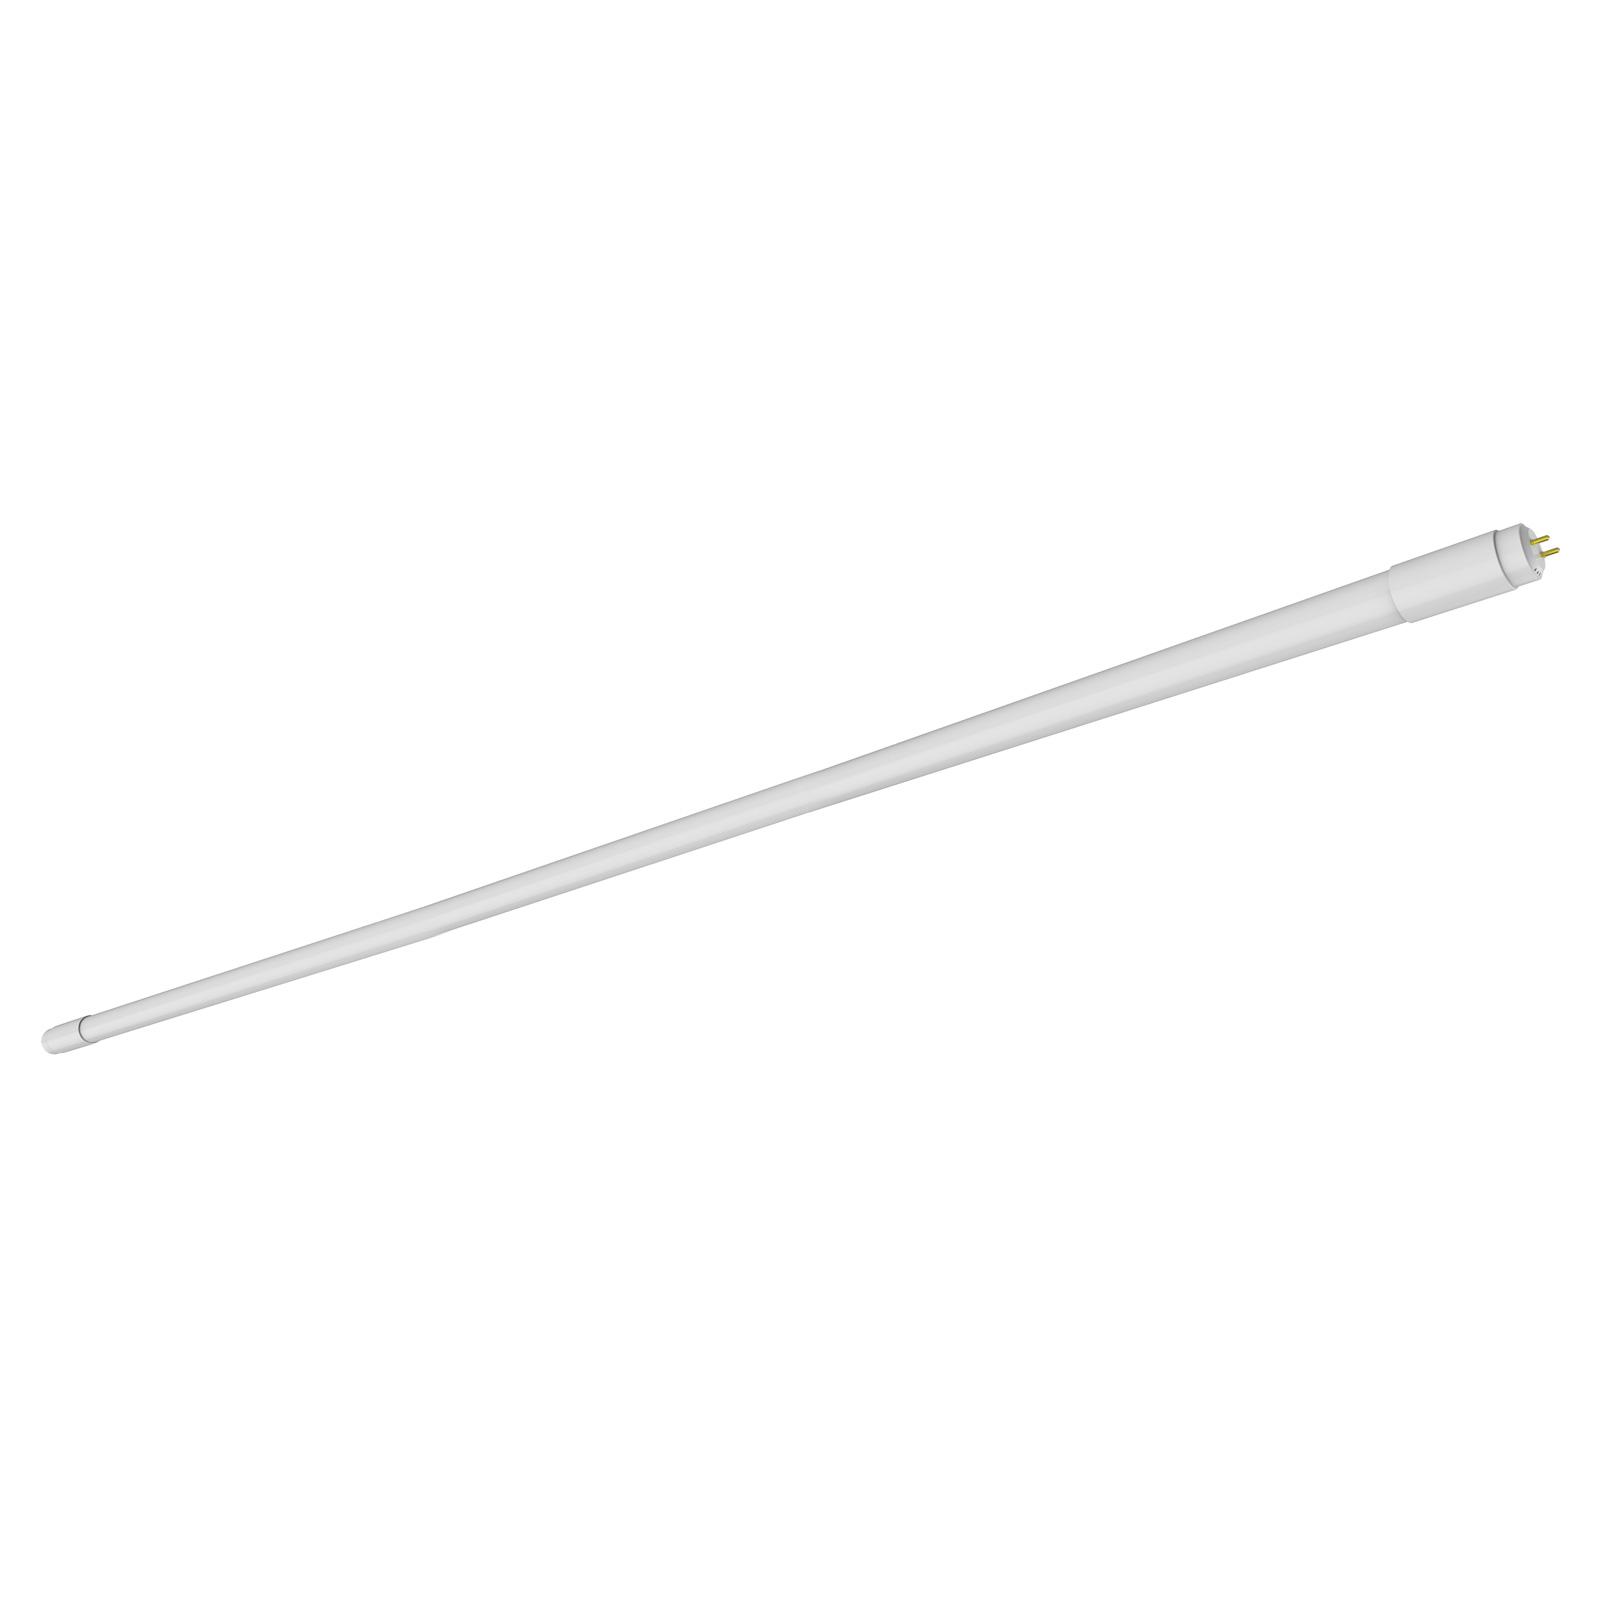 LED Tube ToLEDo Superia G13 150 cm 24W 3000K